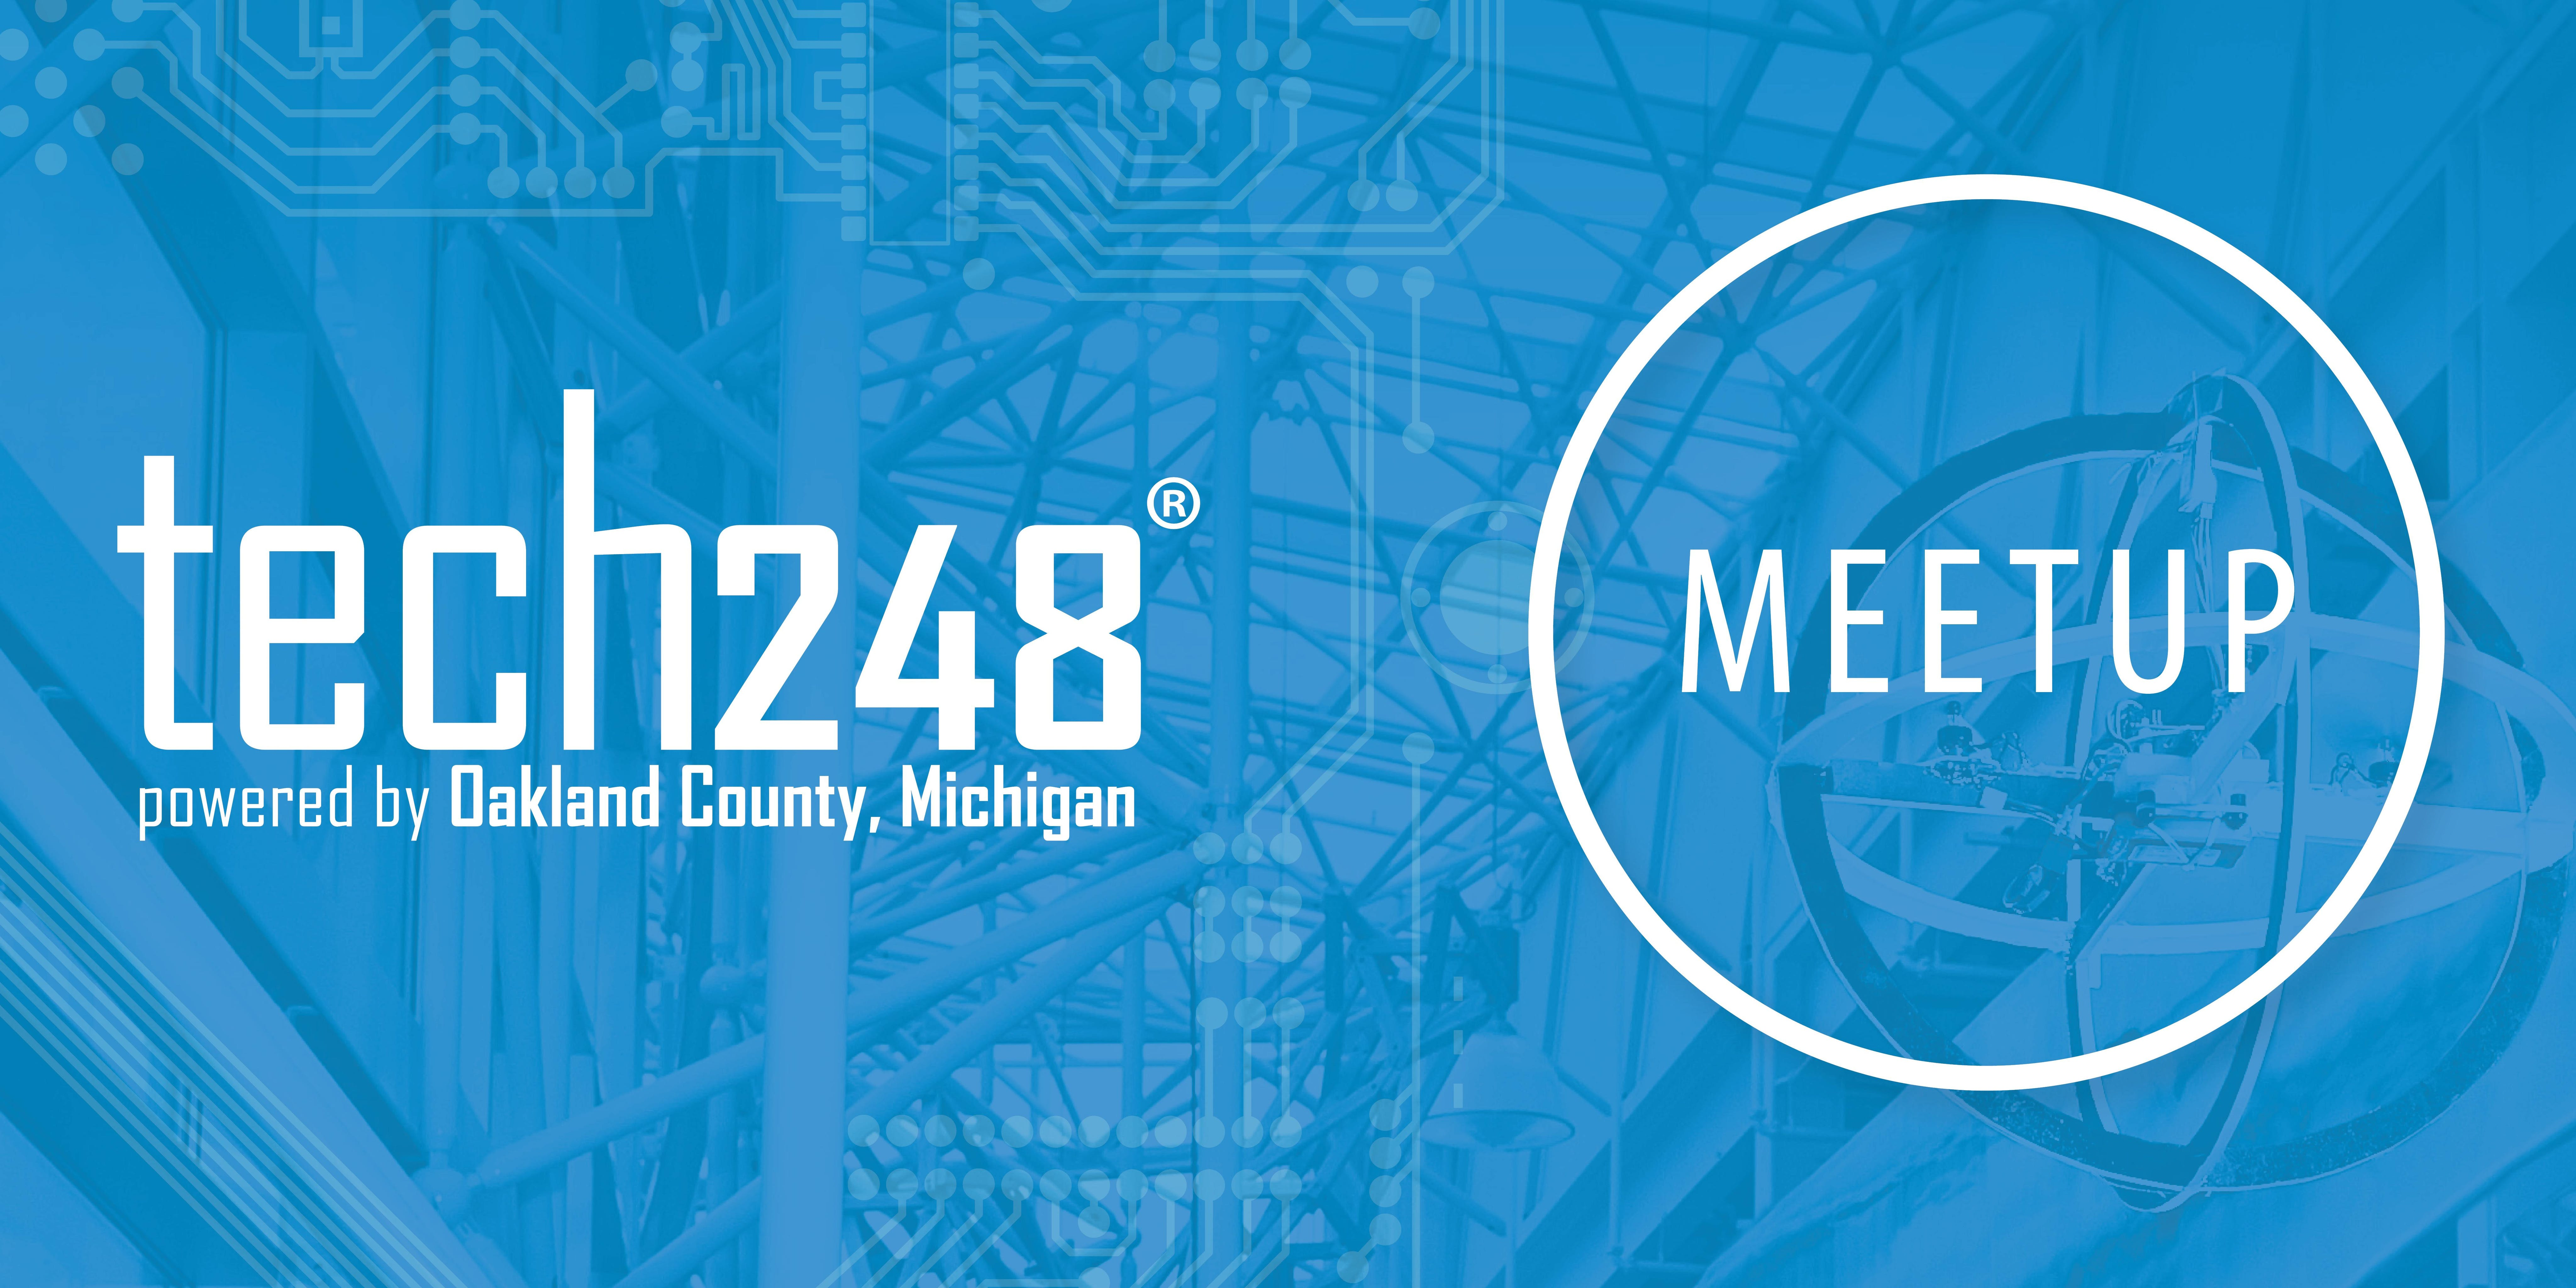 Tech248 February 2019 MeetUp